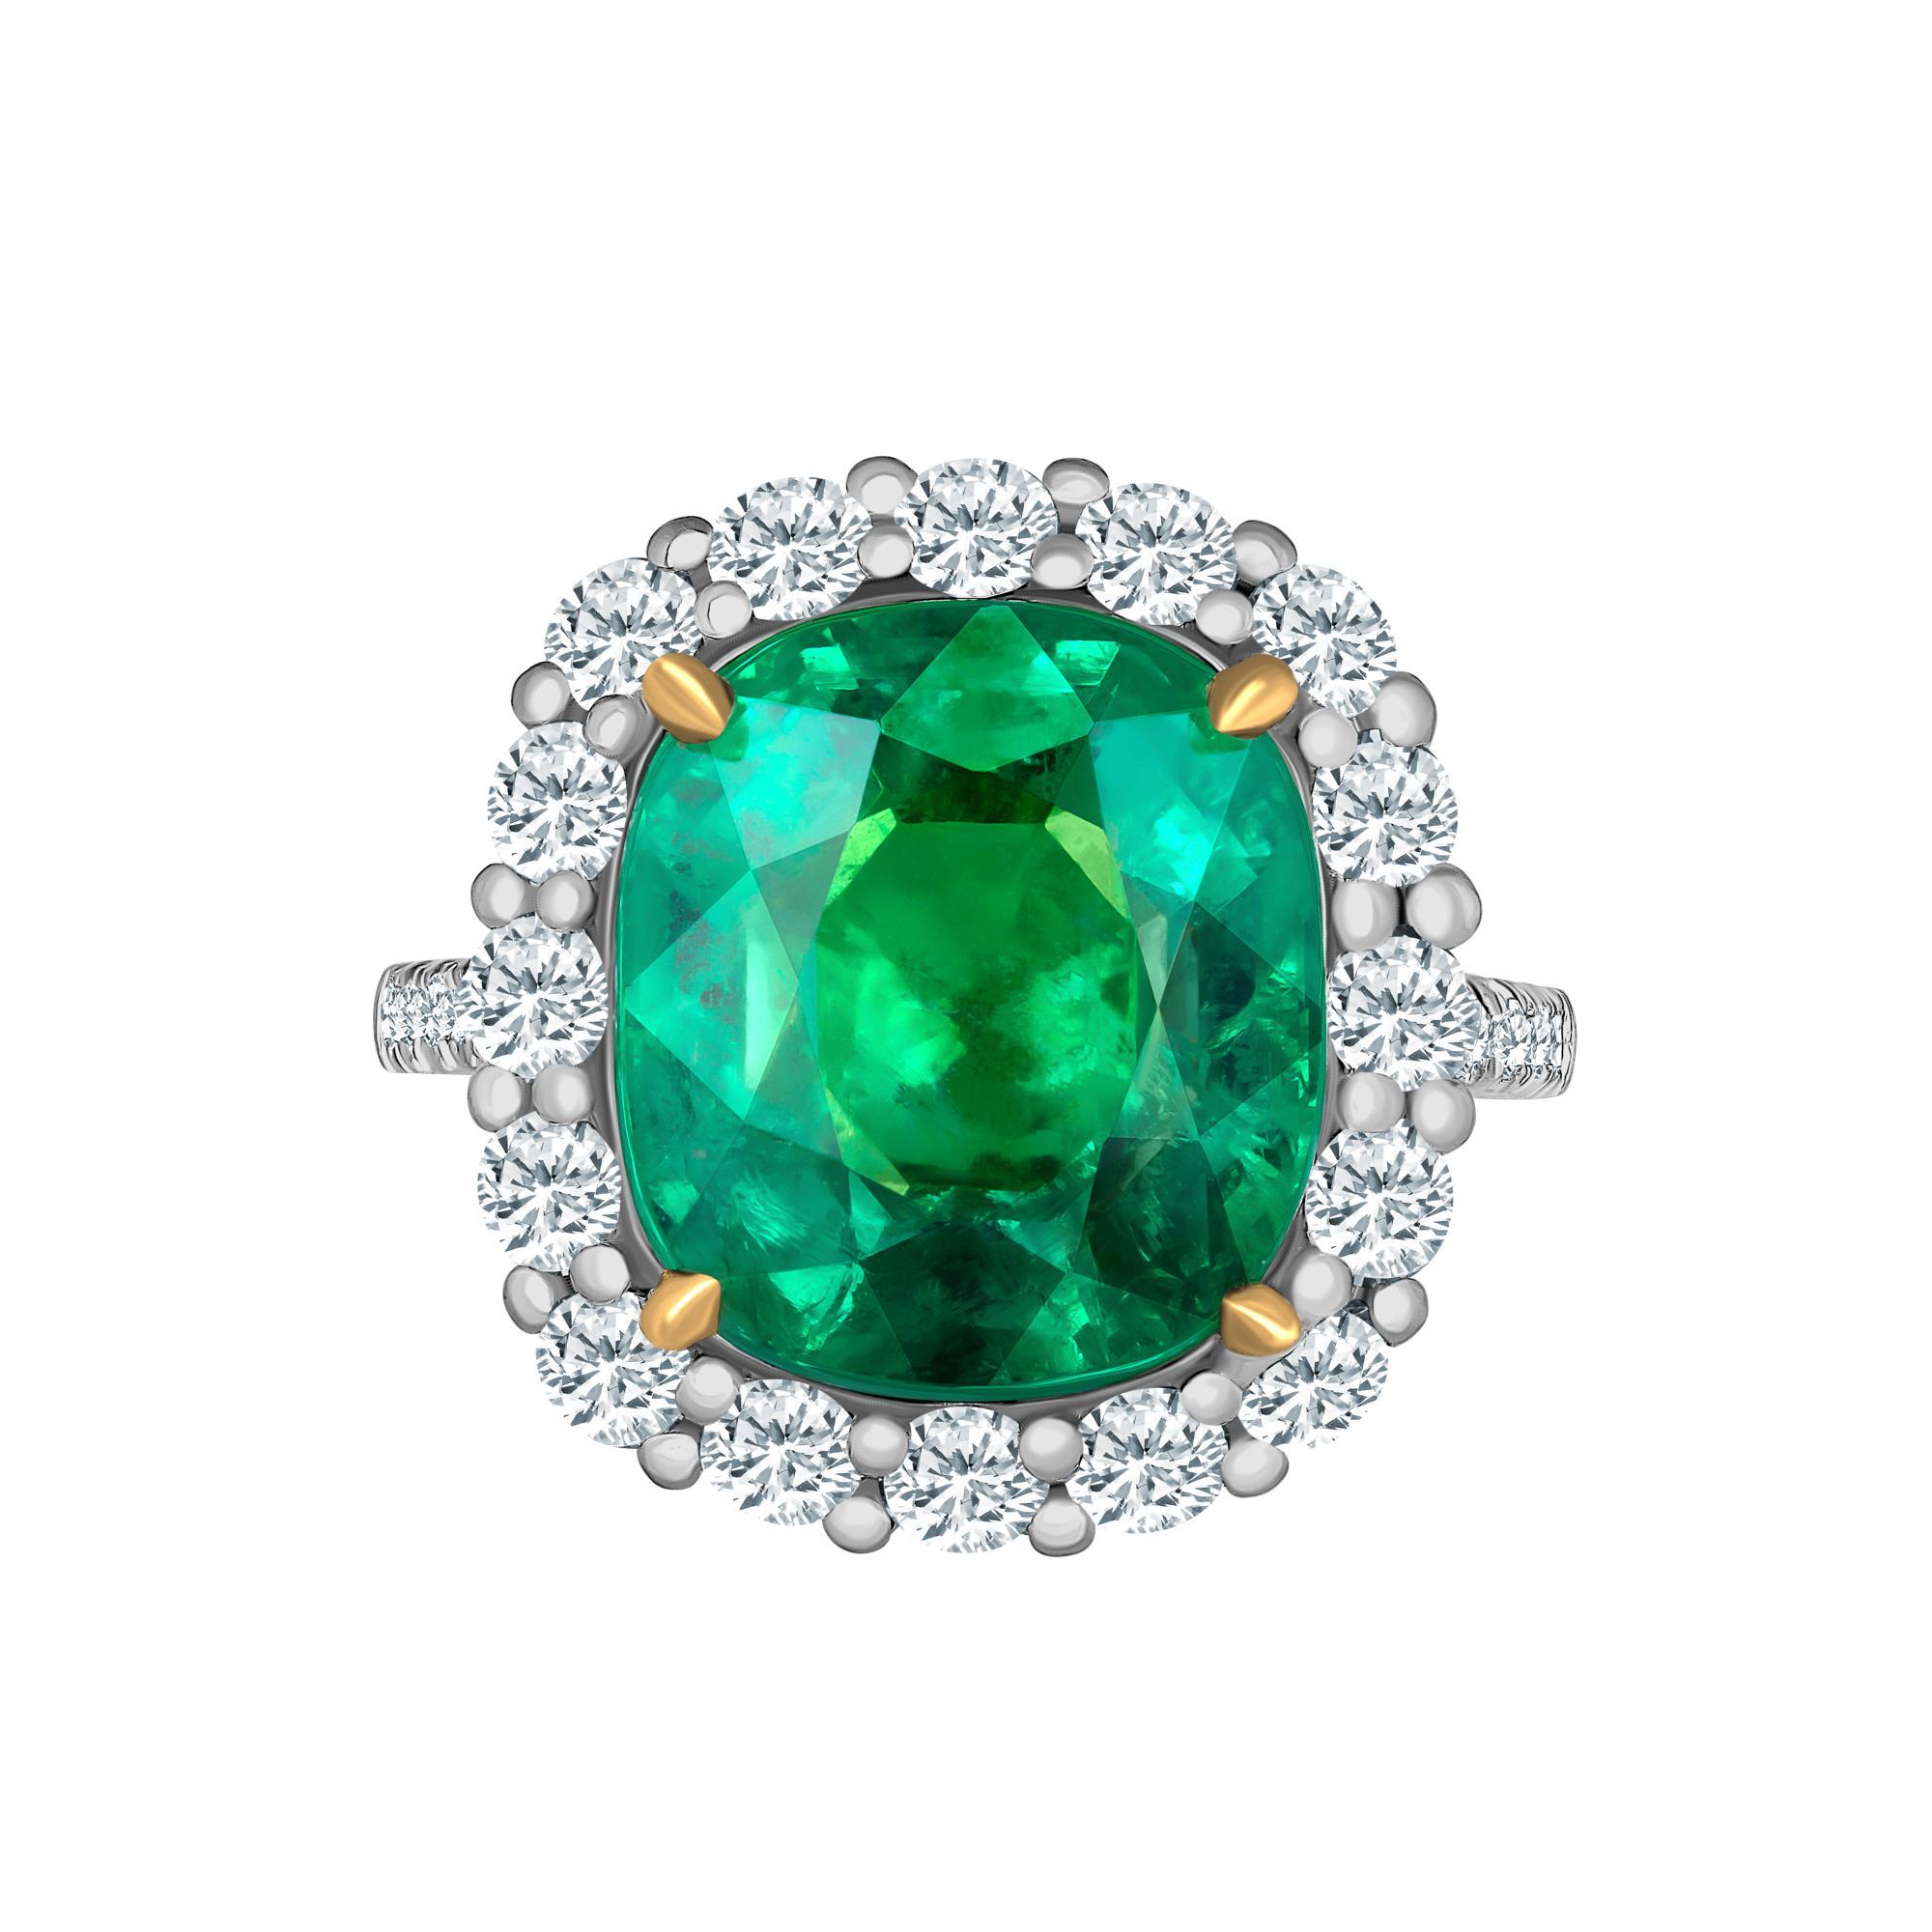 Emilio Jewelry 11.75 Carat Colombian Emerald Diamond Ring